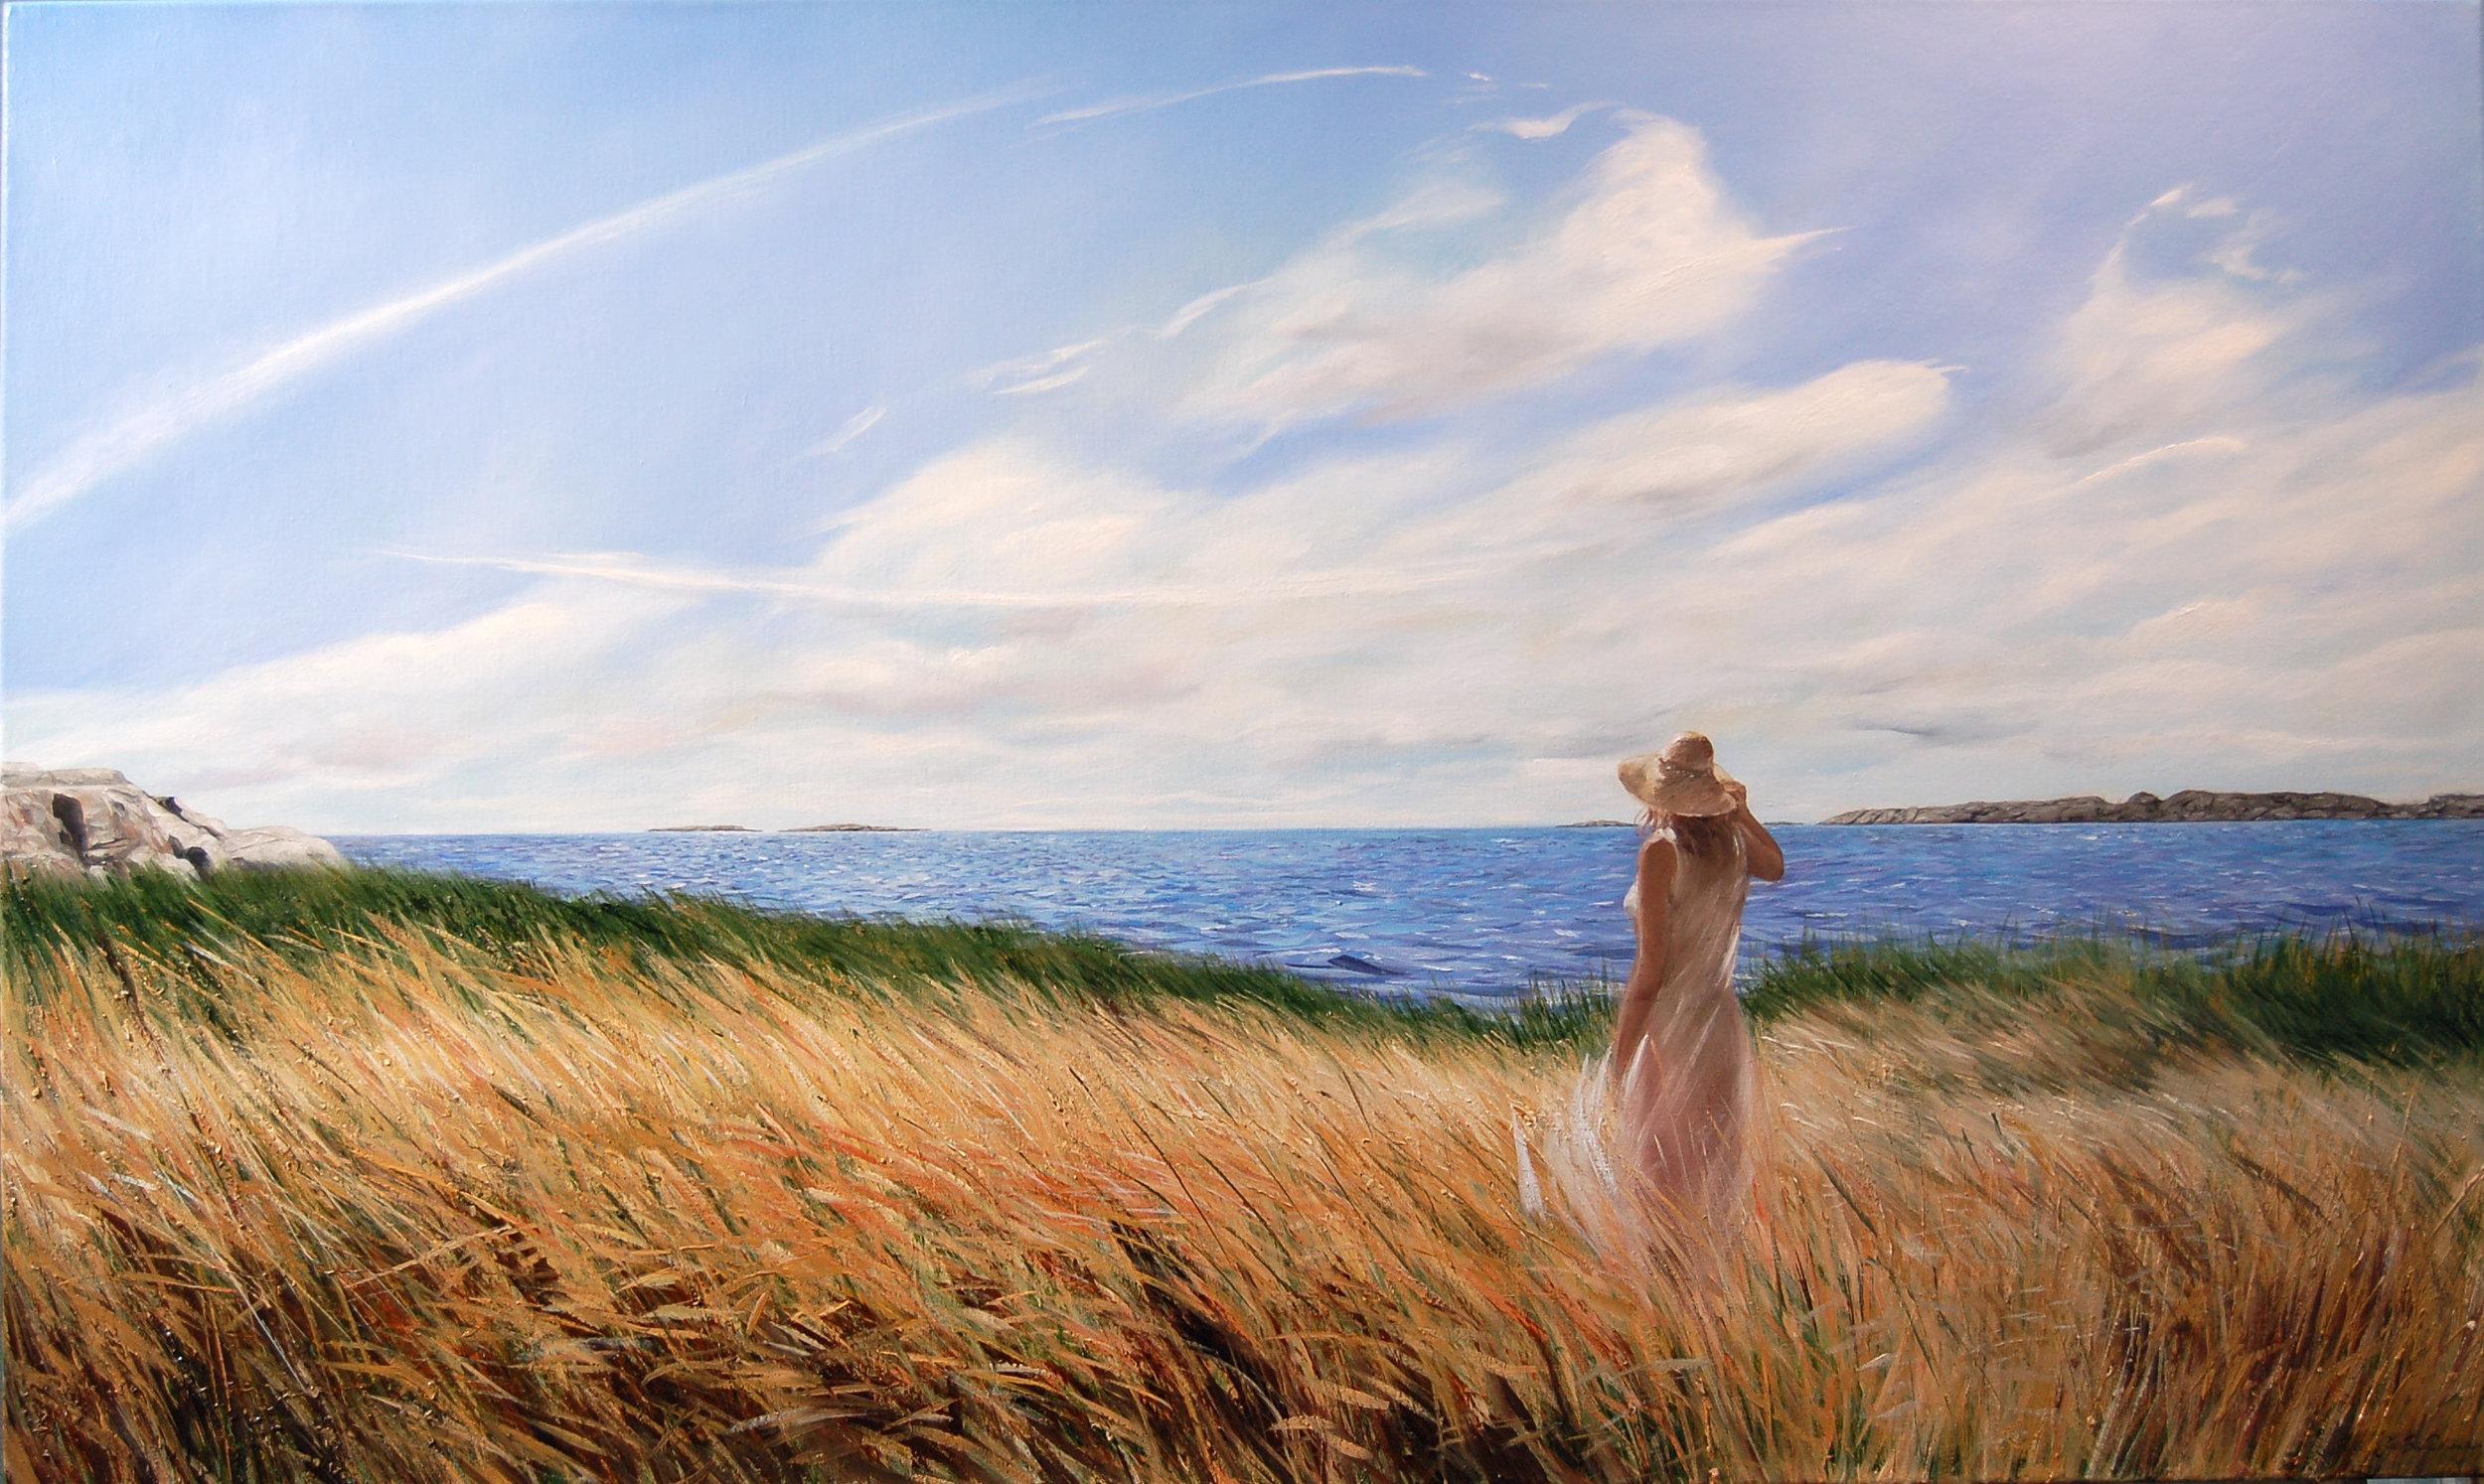 20496934-Jon B. Paulsen. Towards Kløvningen. Oil on Canvas. 32 x 43.3 in Printprice 100$..jpg